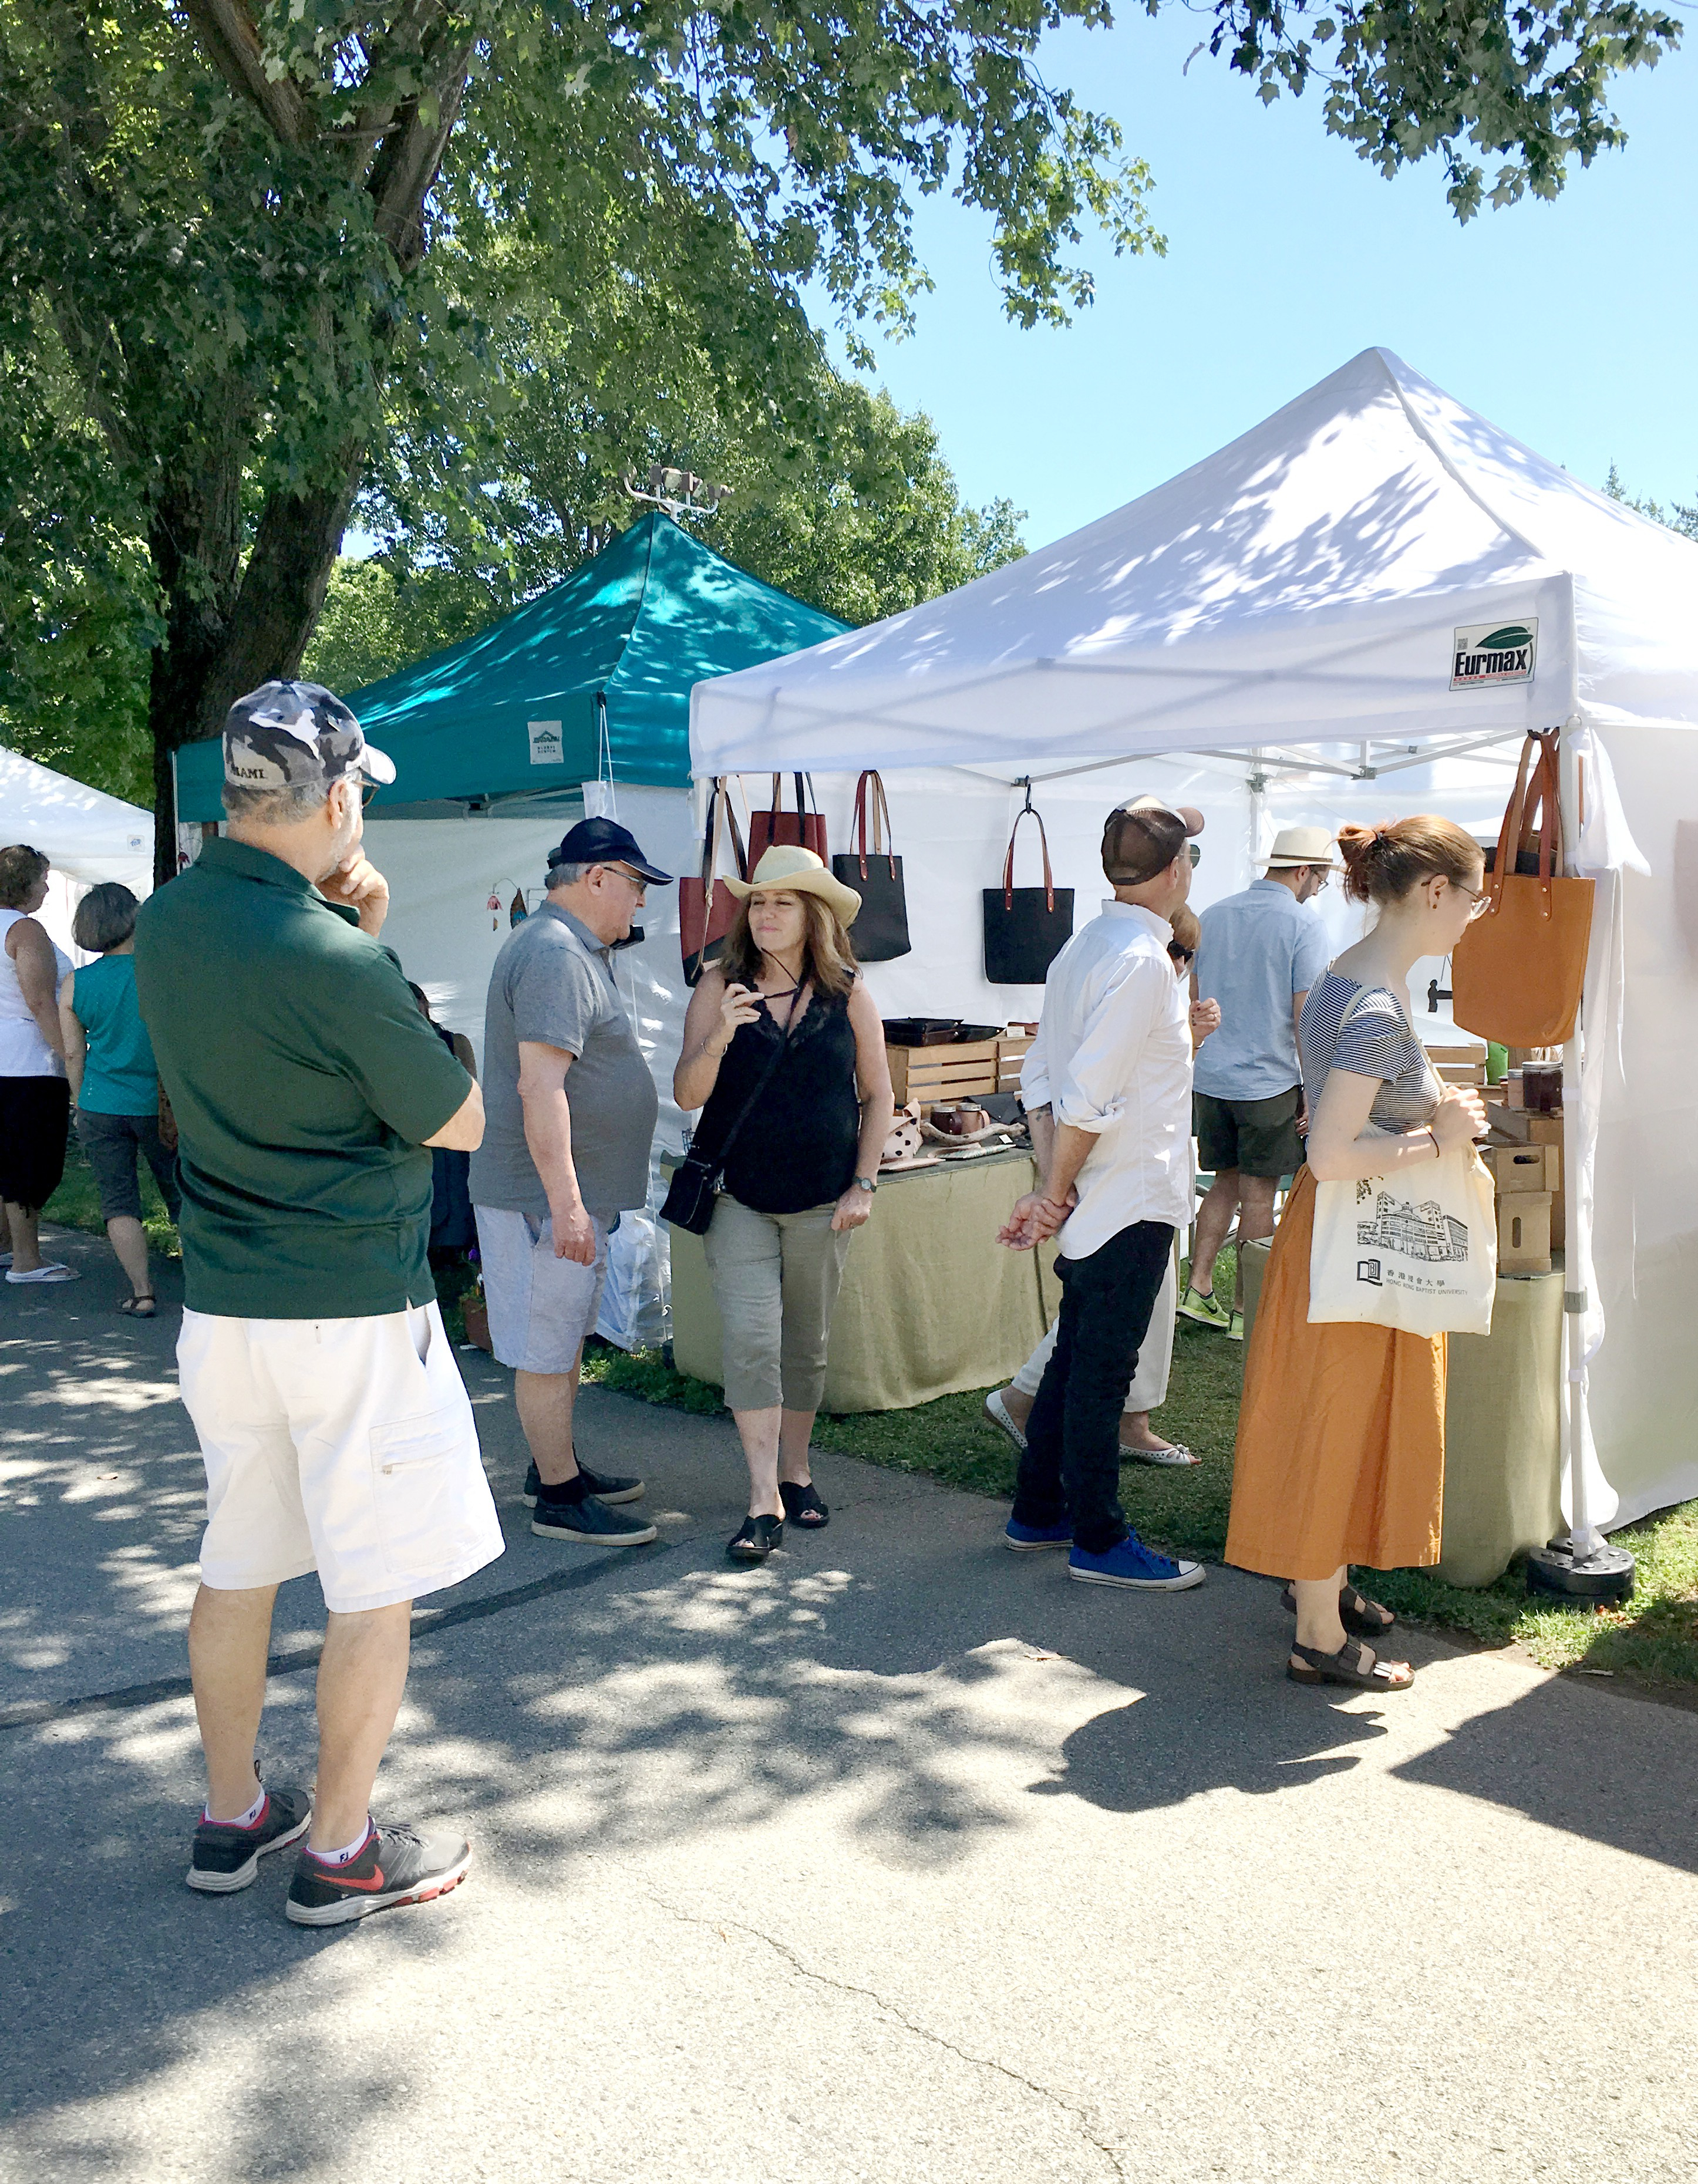 Rhinebeck Crafts Festival 2020 With Regard To Dutchess County Fair Ground 2021 Calendar